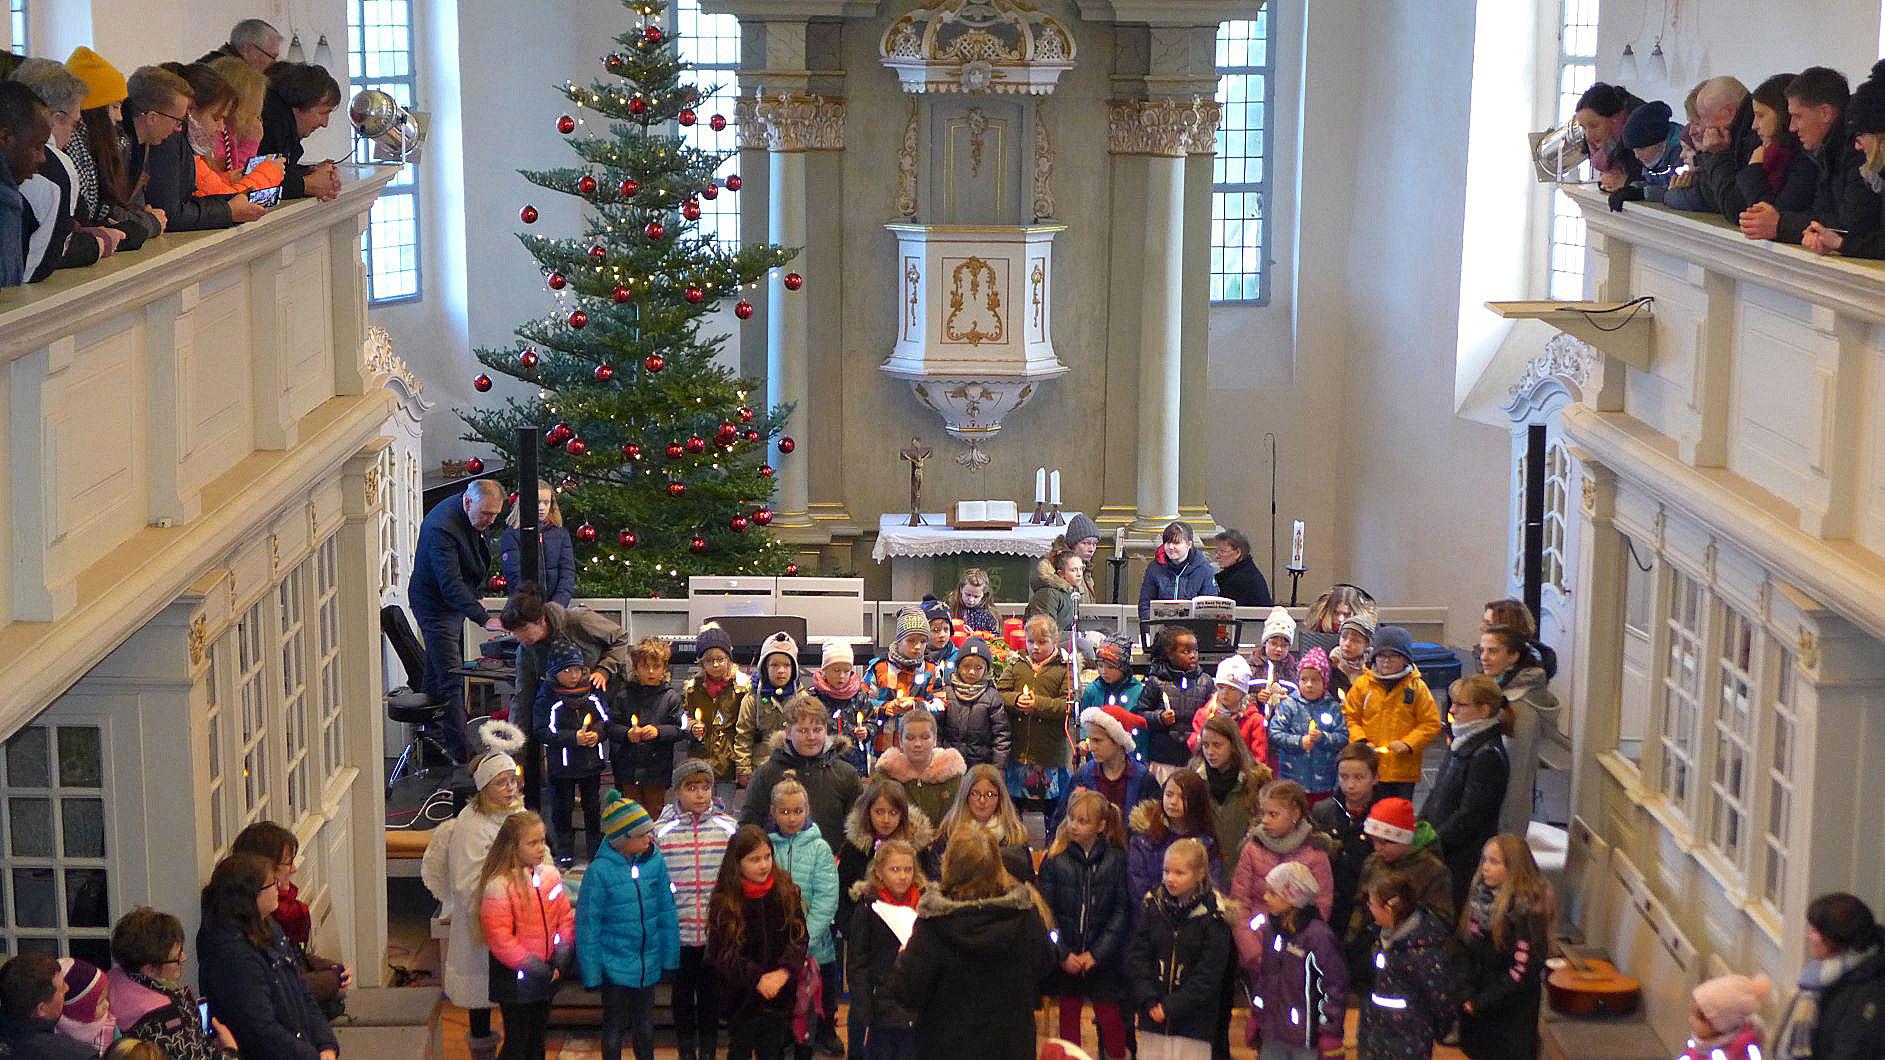 Volles Haus - Weihnachtskonzert in der Lambertuskirche Brück